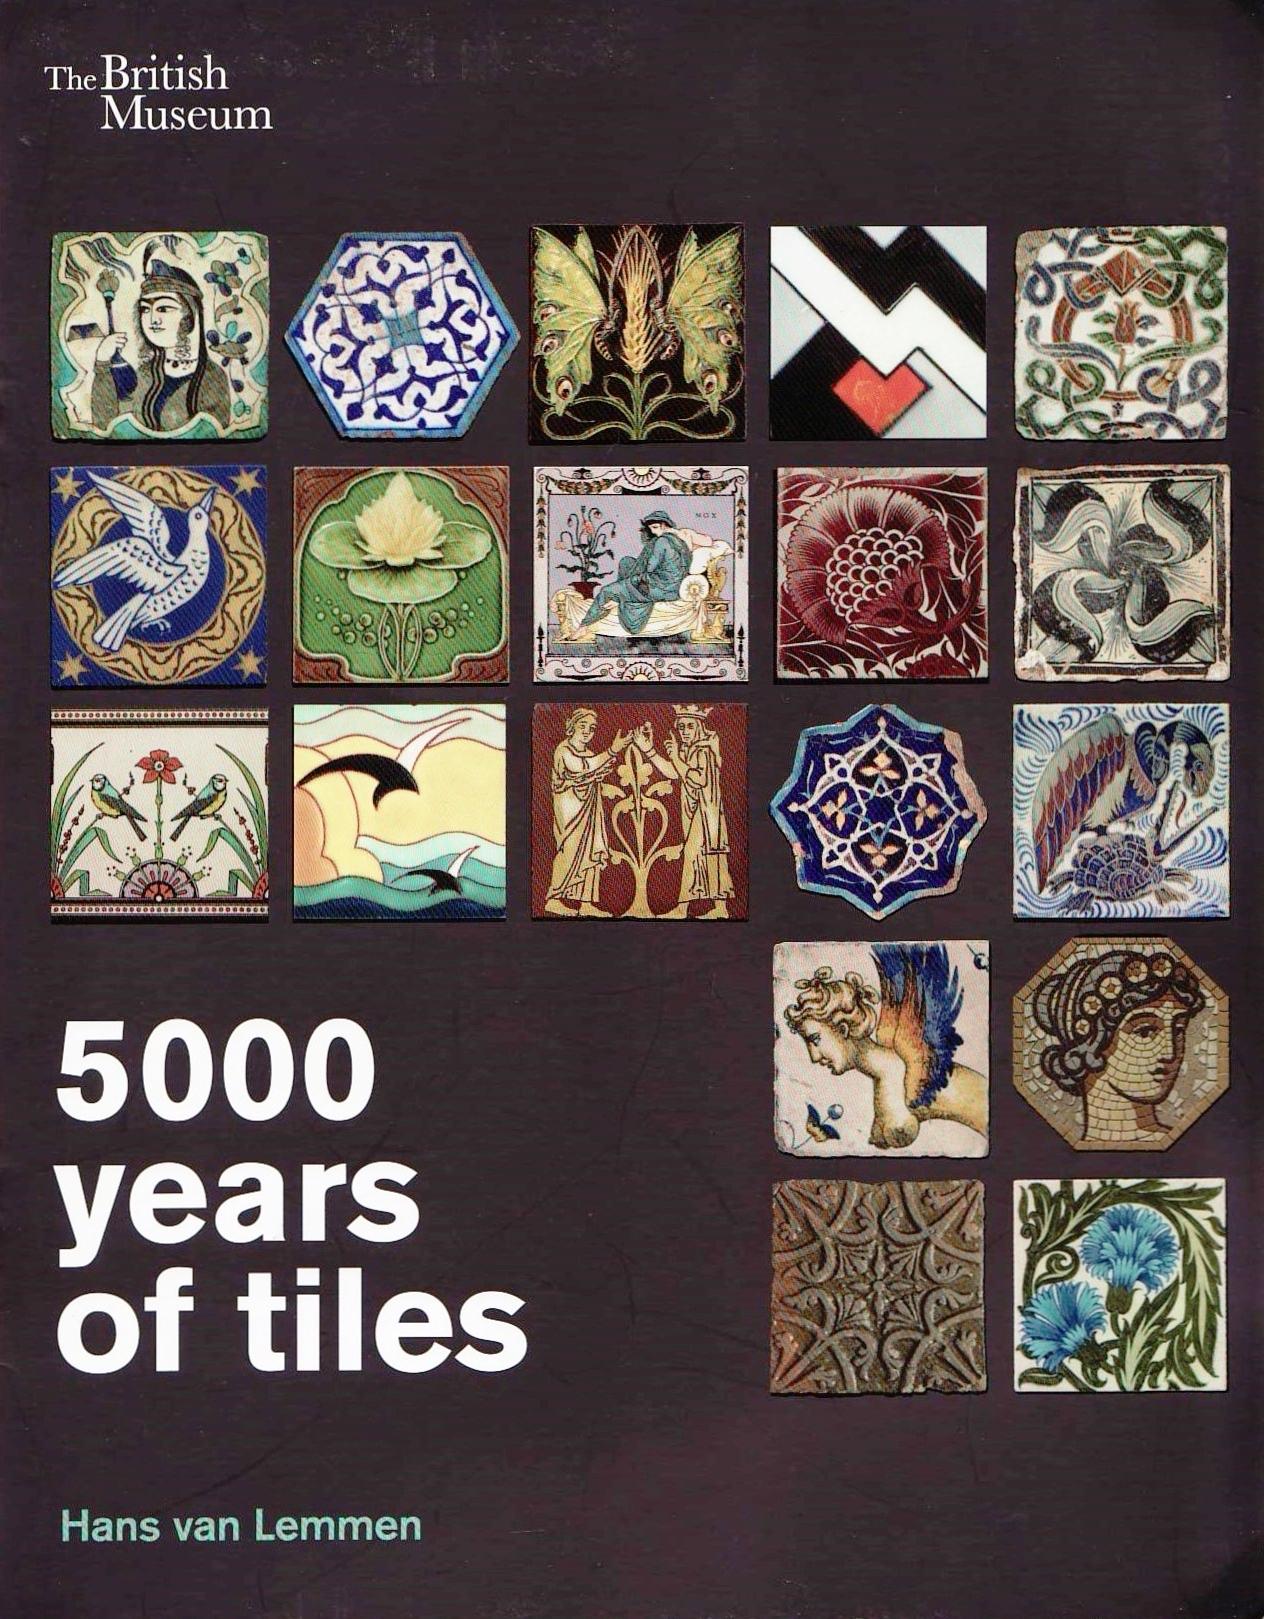 Hans van lemmen historical tiles books on tiles book cover 21 dailygadgetfo Images